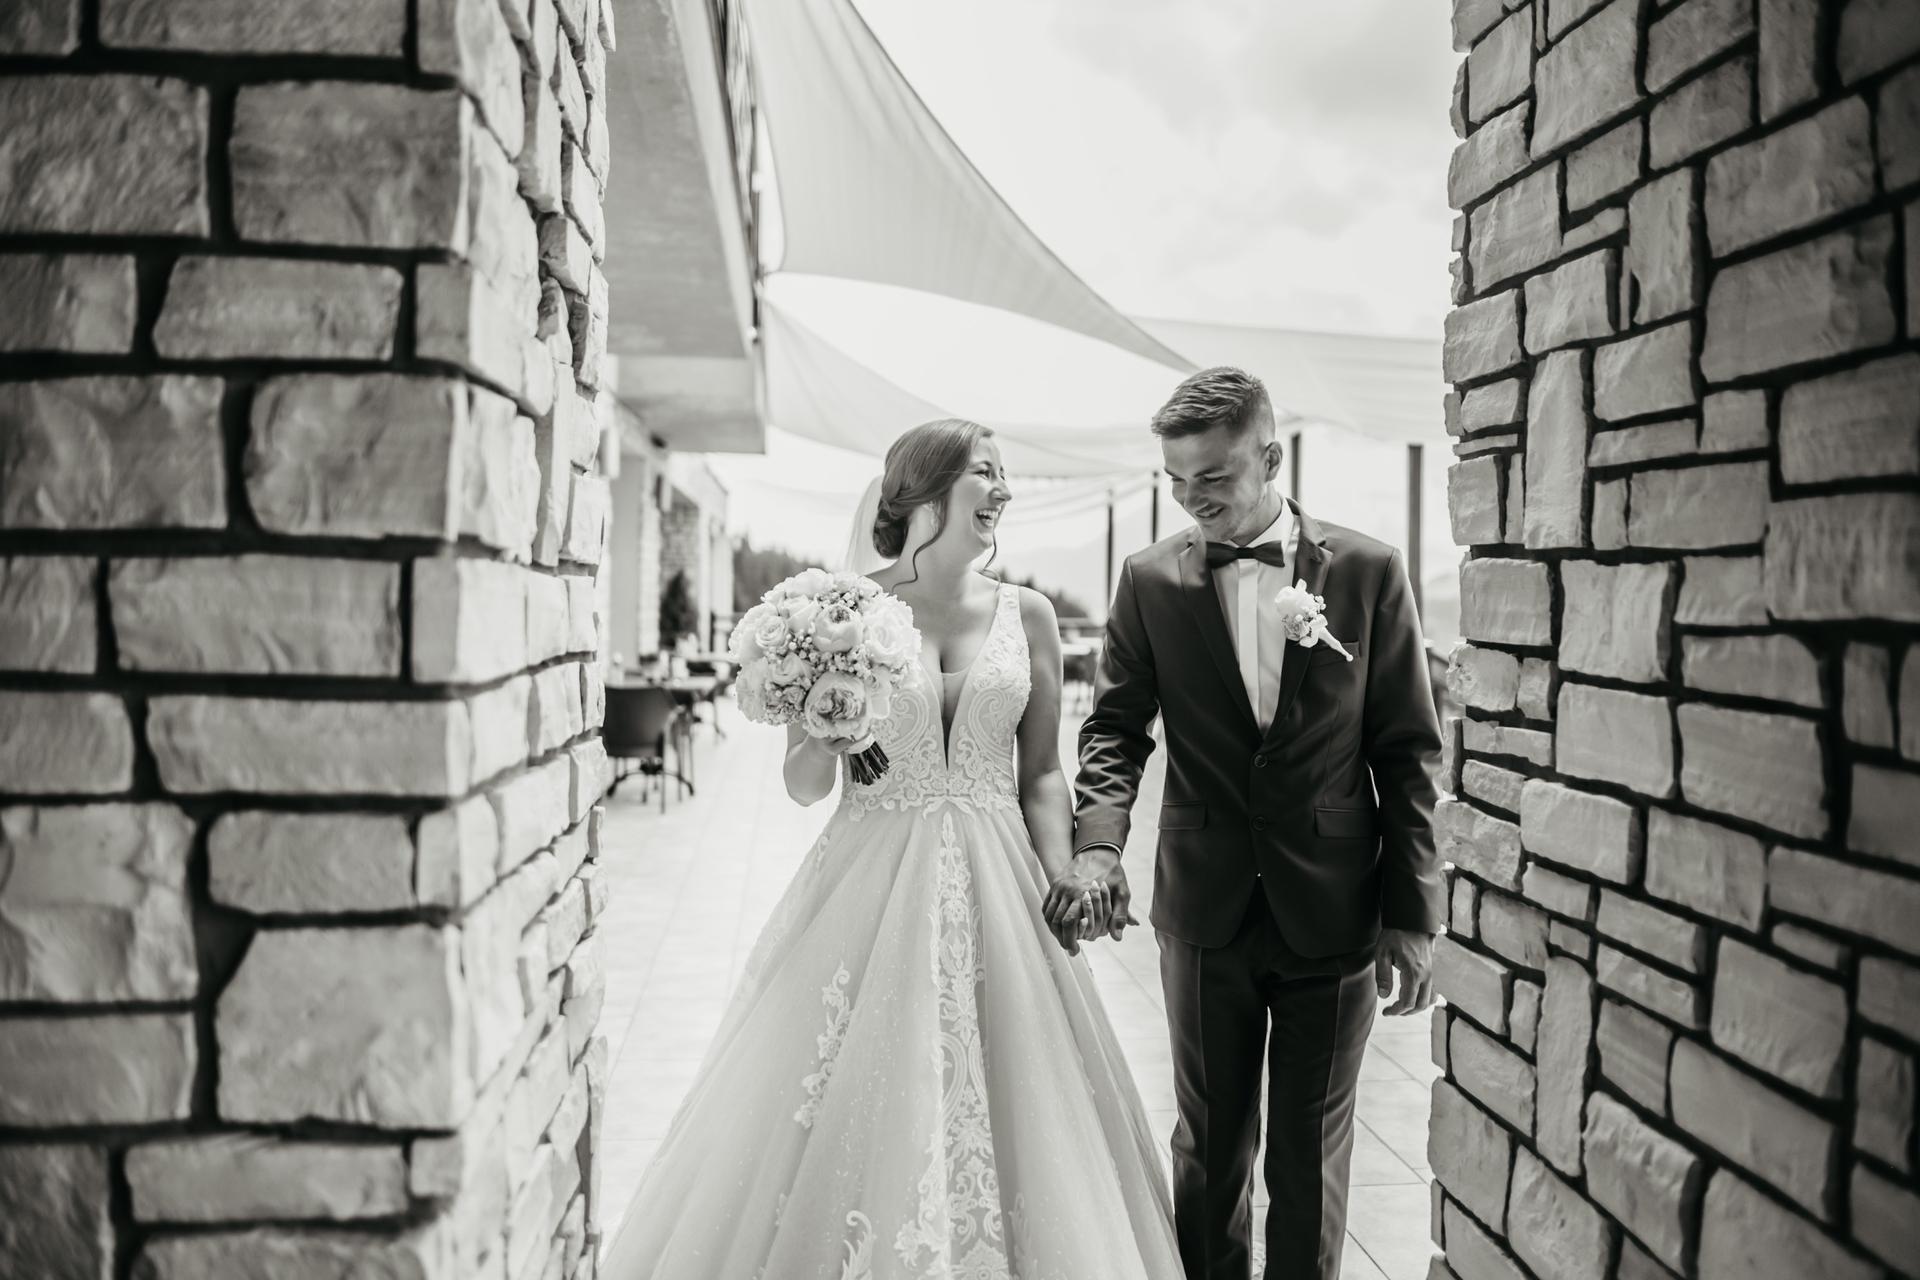 Our wedding ❤️ - Obrázok č. 4